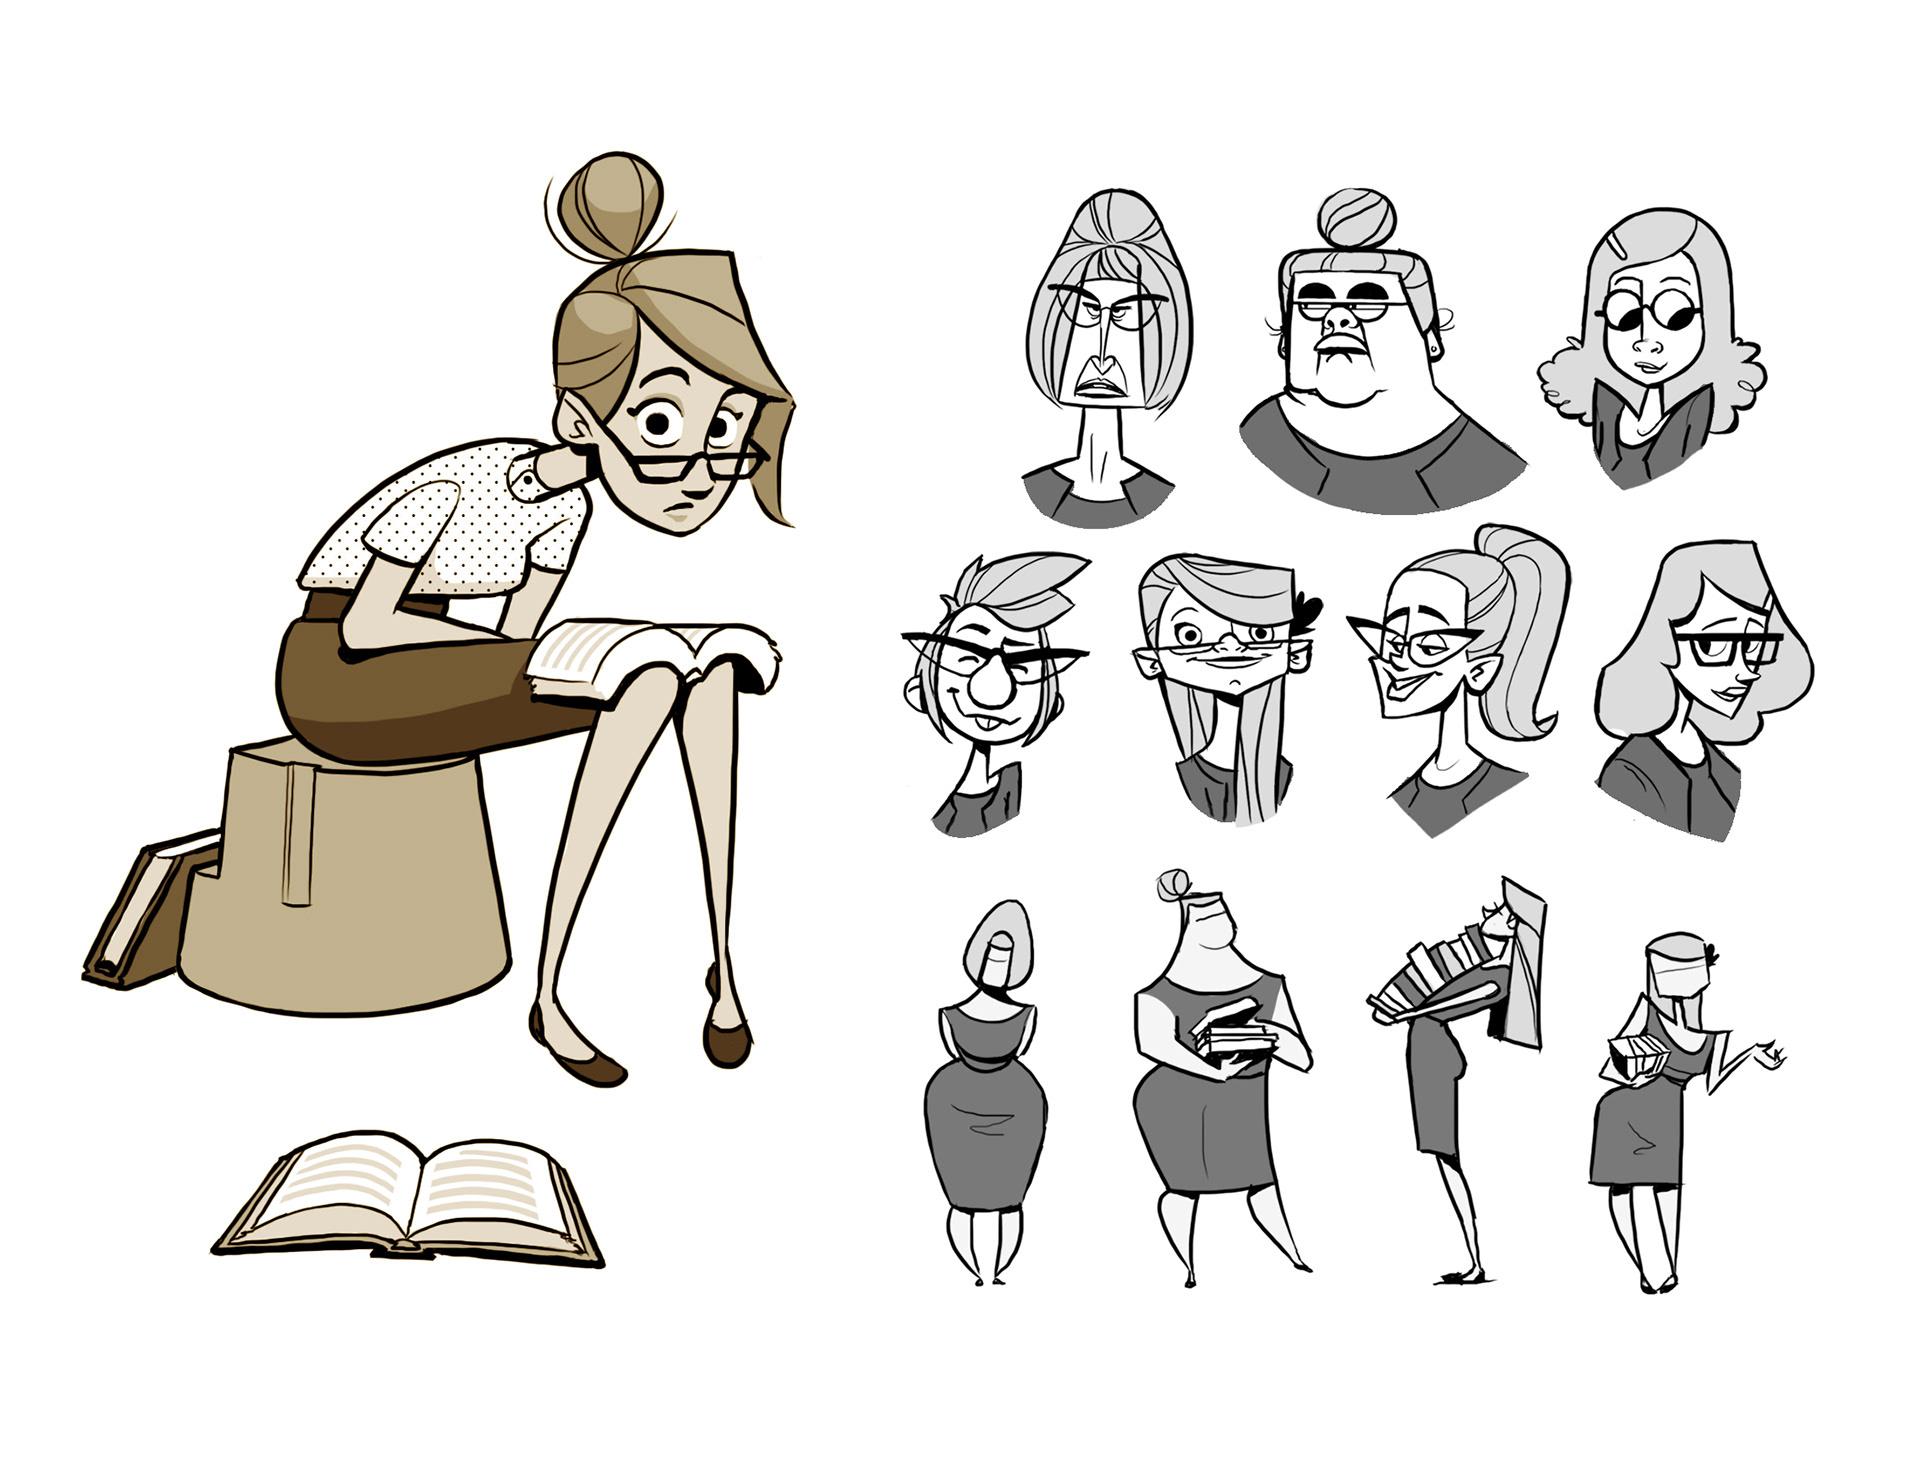 jonathan sundy character design collection